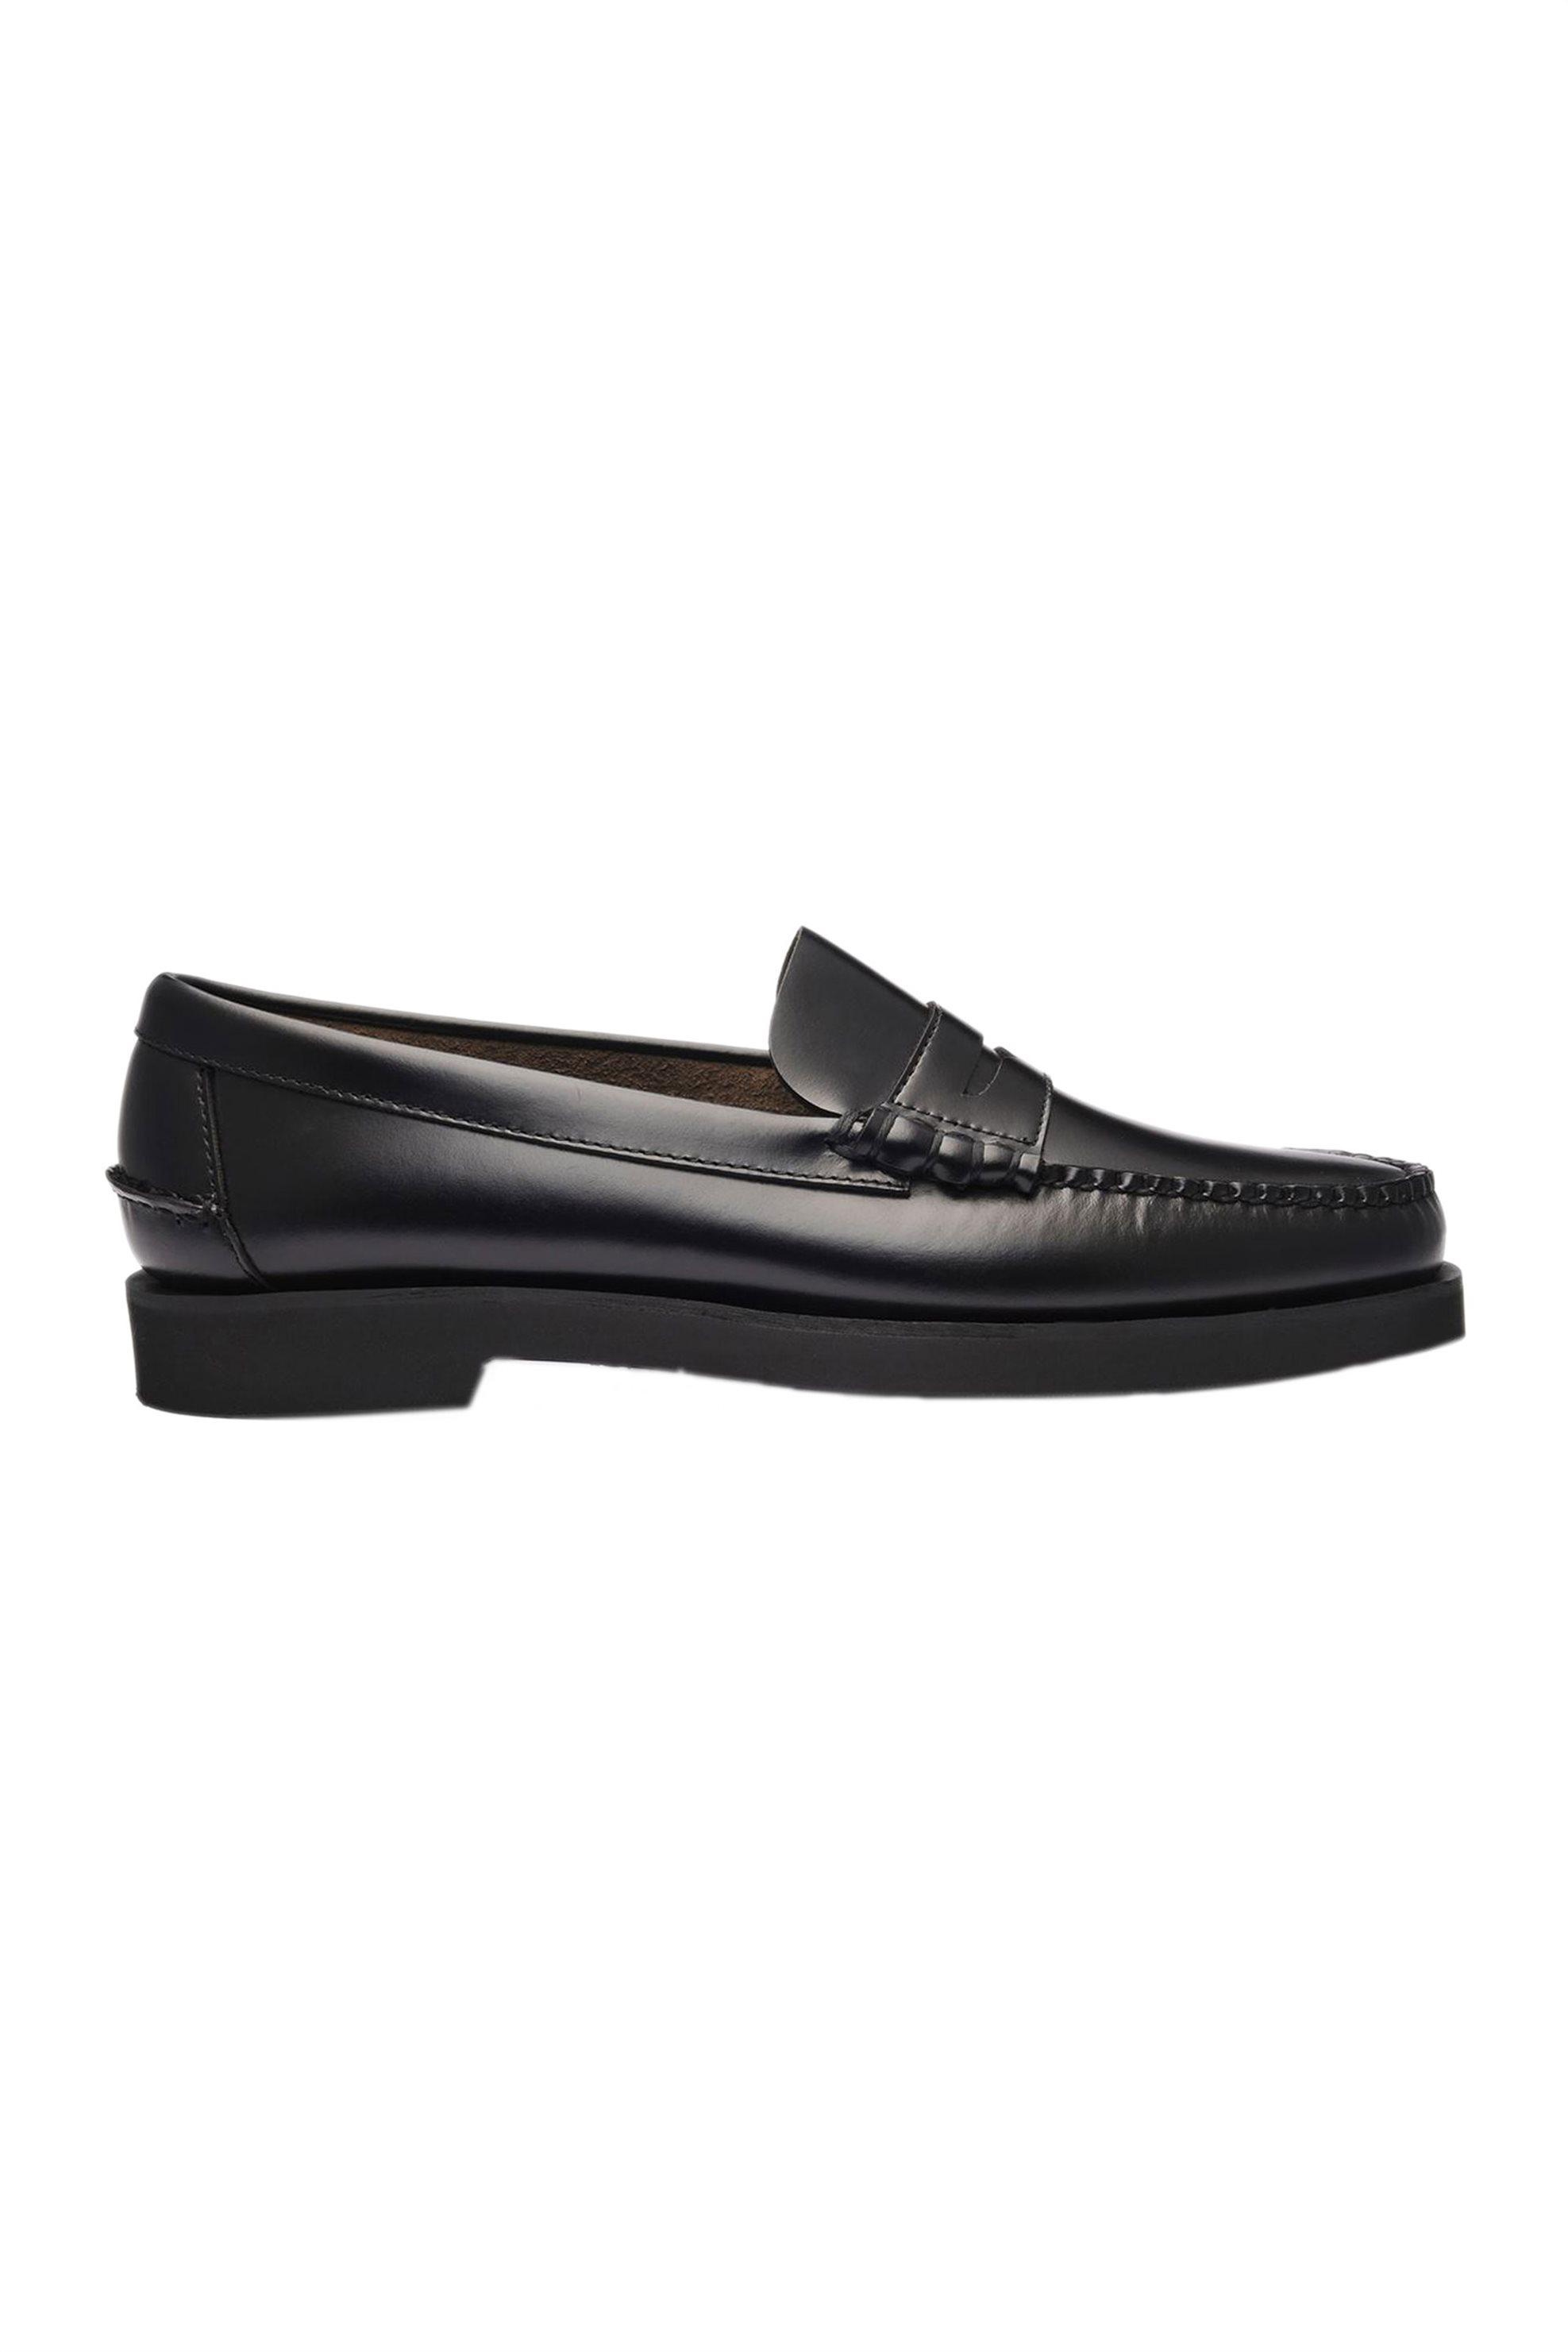 "Sebago® ανδρικά penny loafers δερμάτινα ""Dan Polaris"" – L7001GW0-902R – Μαύρο"